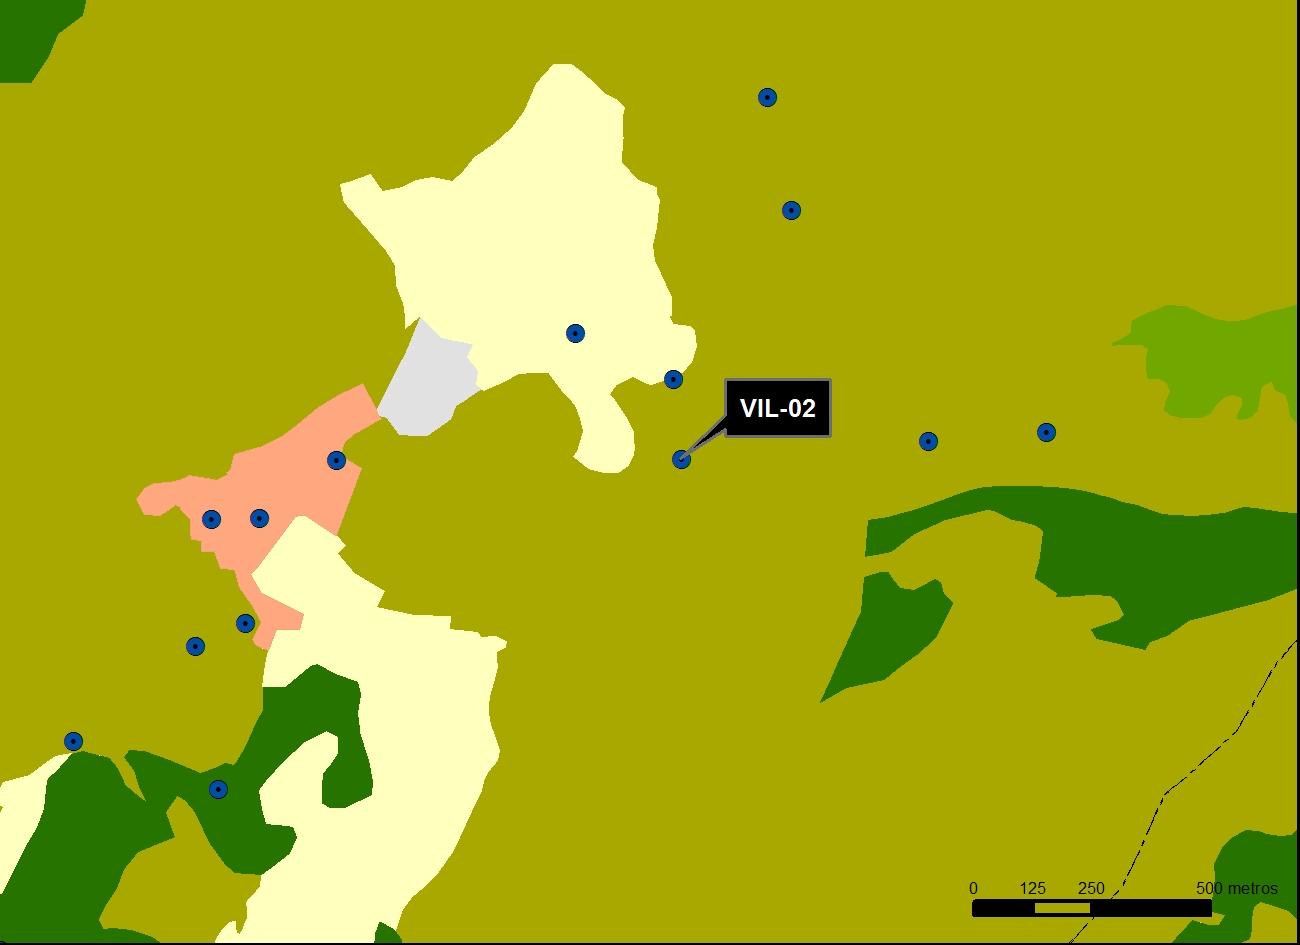 VIL_02_M.V.LOZANO_CARRERAS_MAP.VEG